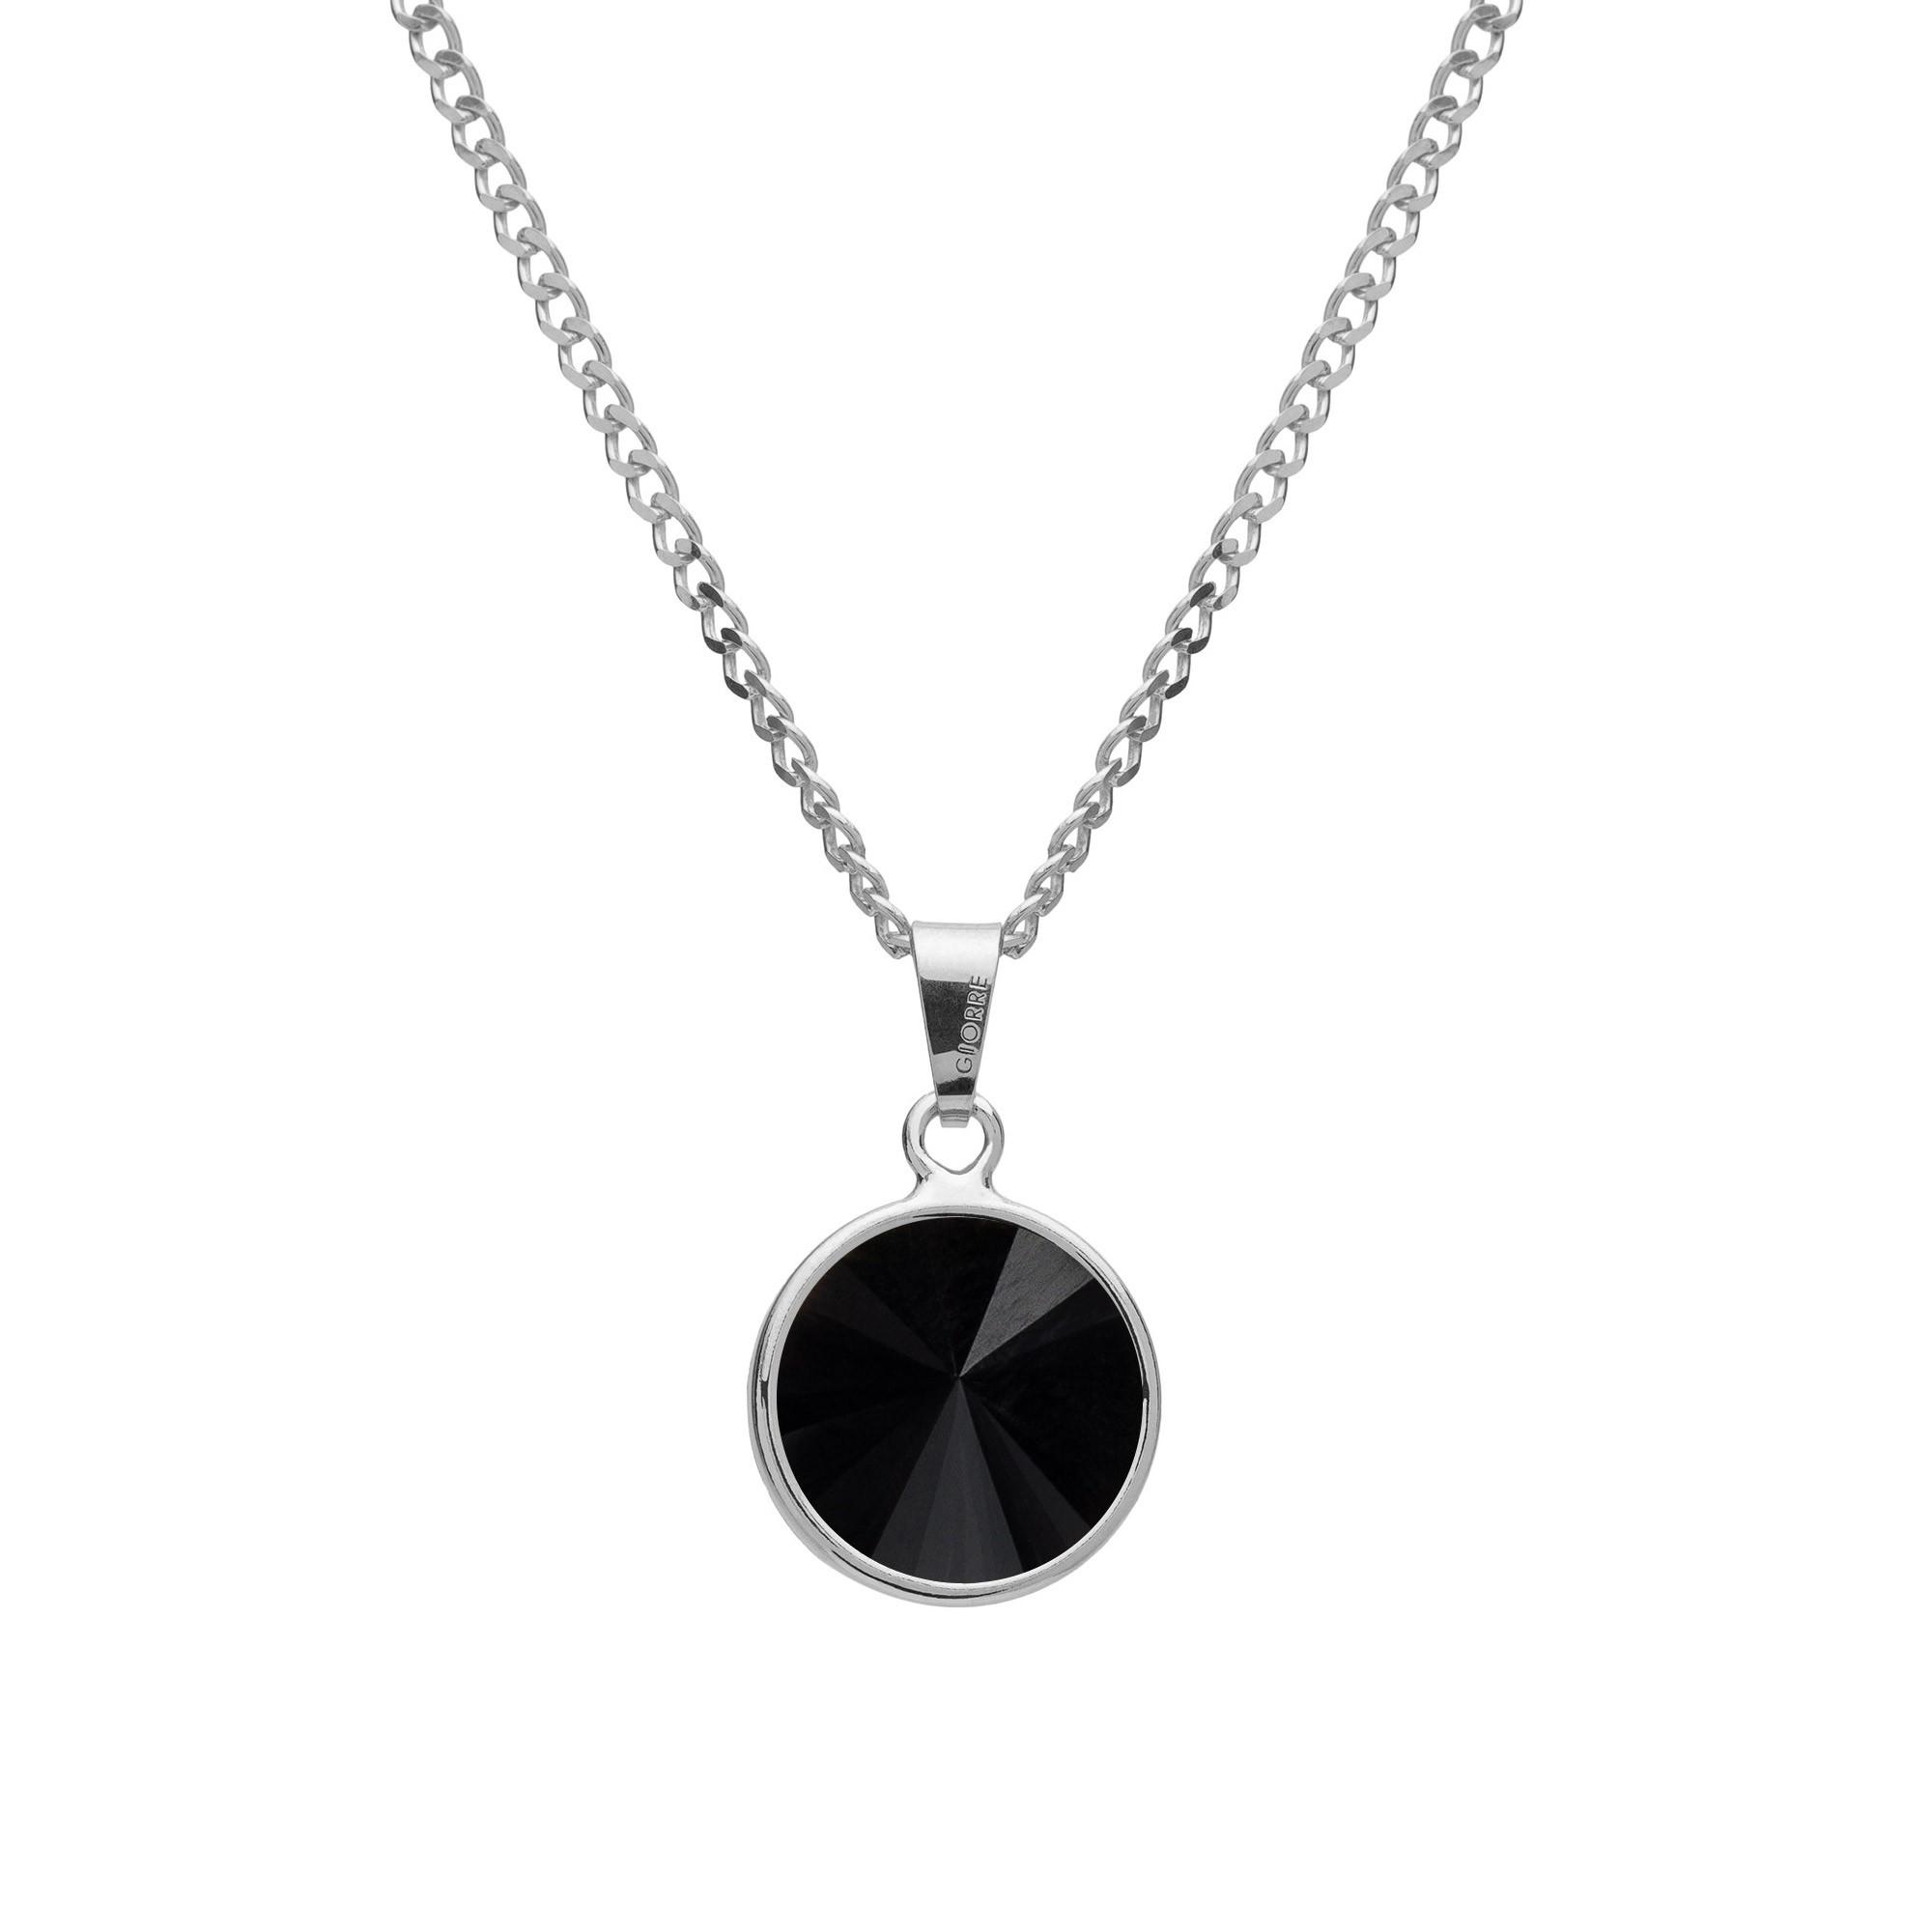 Srebrny naszyjnik z naturalnym kamieniem - onyx srebro 925